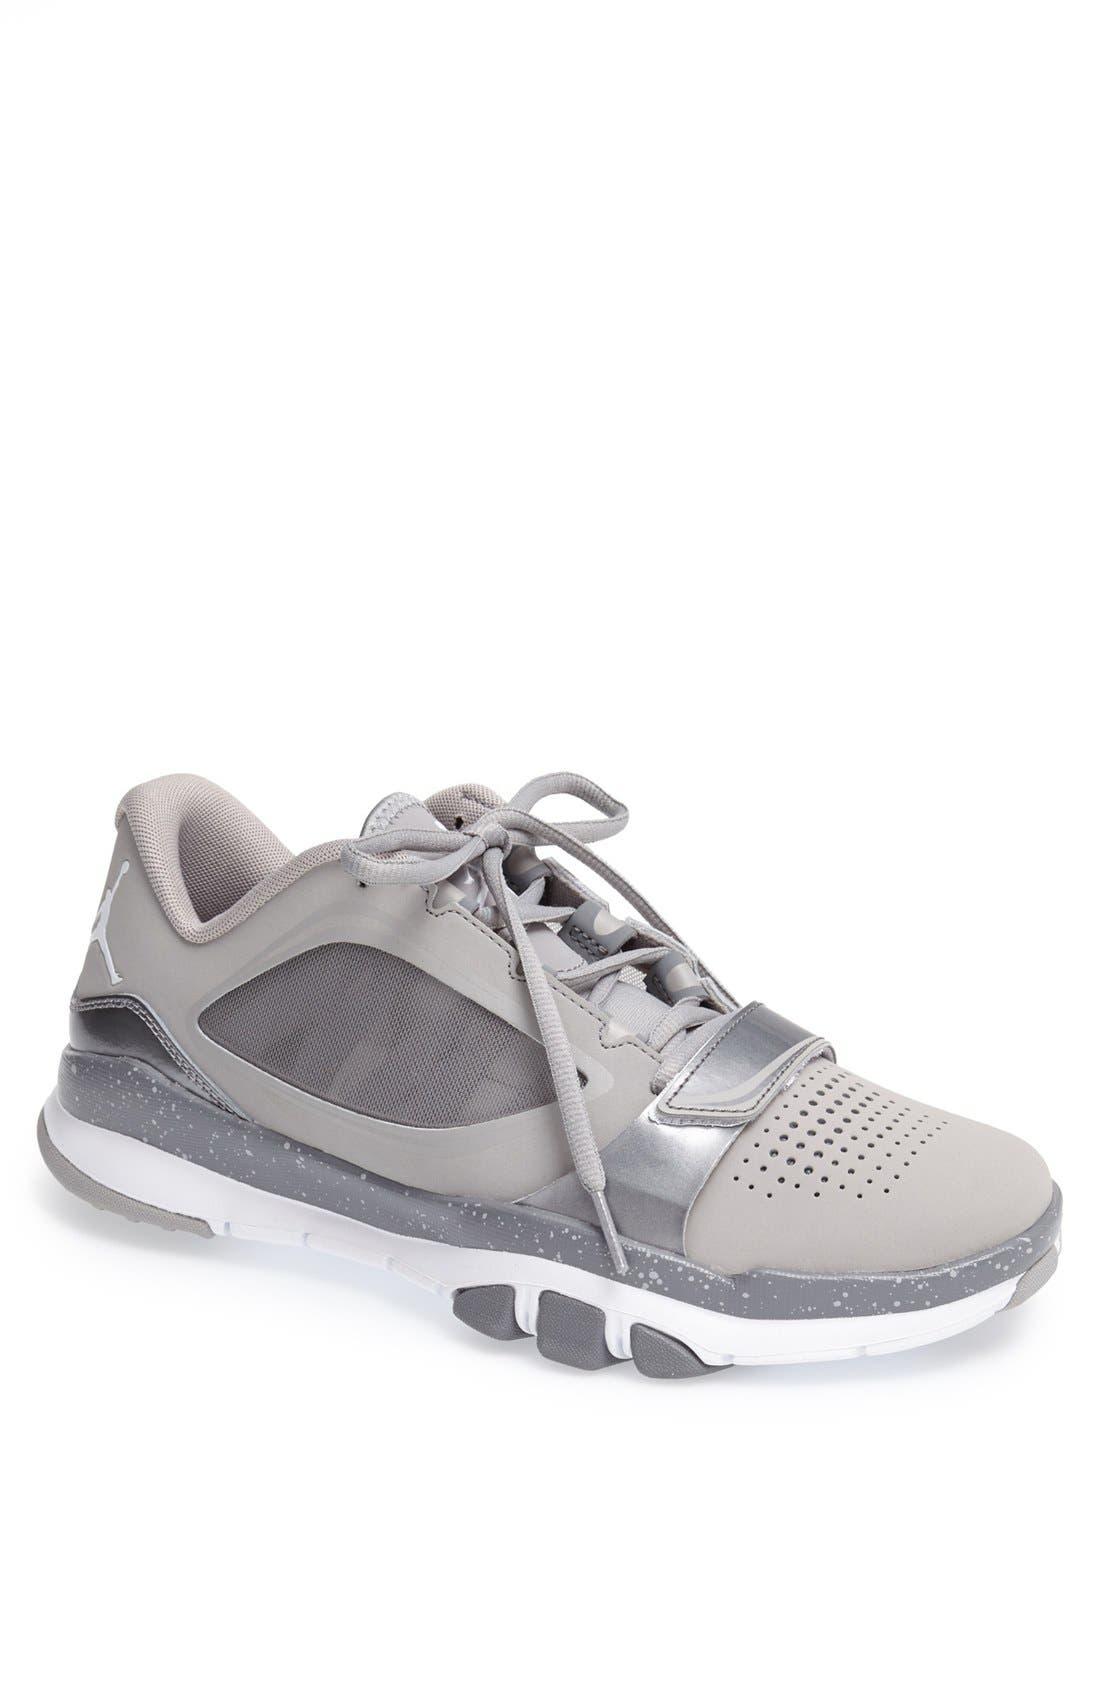 Alternate Image 1 Selected - Nike 'Jordan Trunner Dominate FLX' Training Shoe (Men)